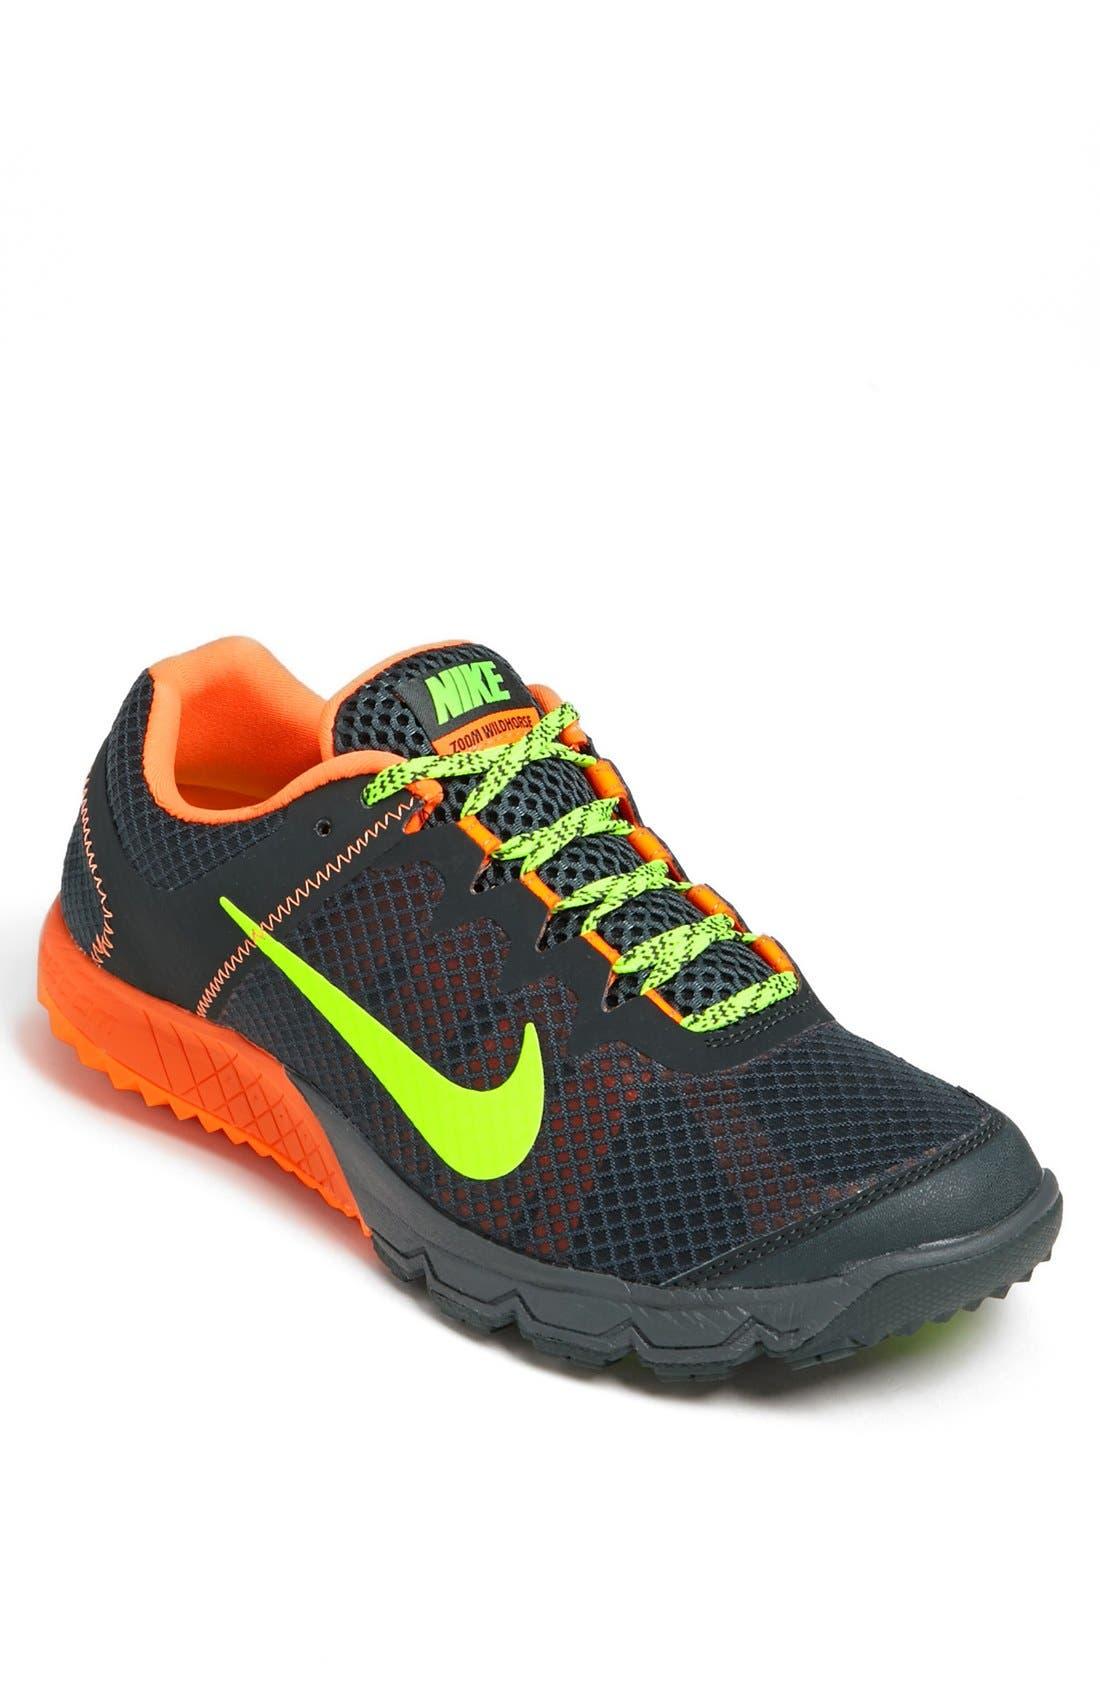 Main Image - Nike 'Zoom Wildhorse' Trail Running Shoe (Men)